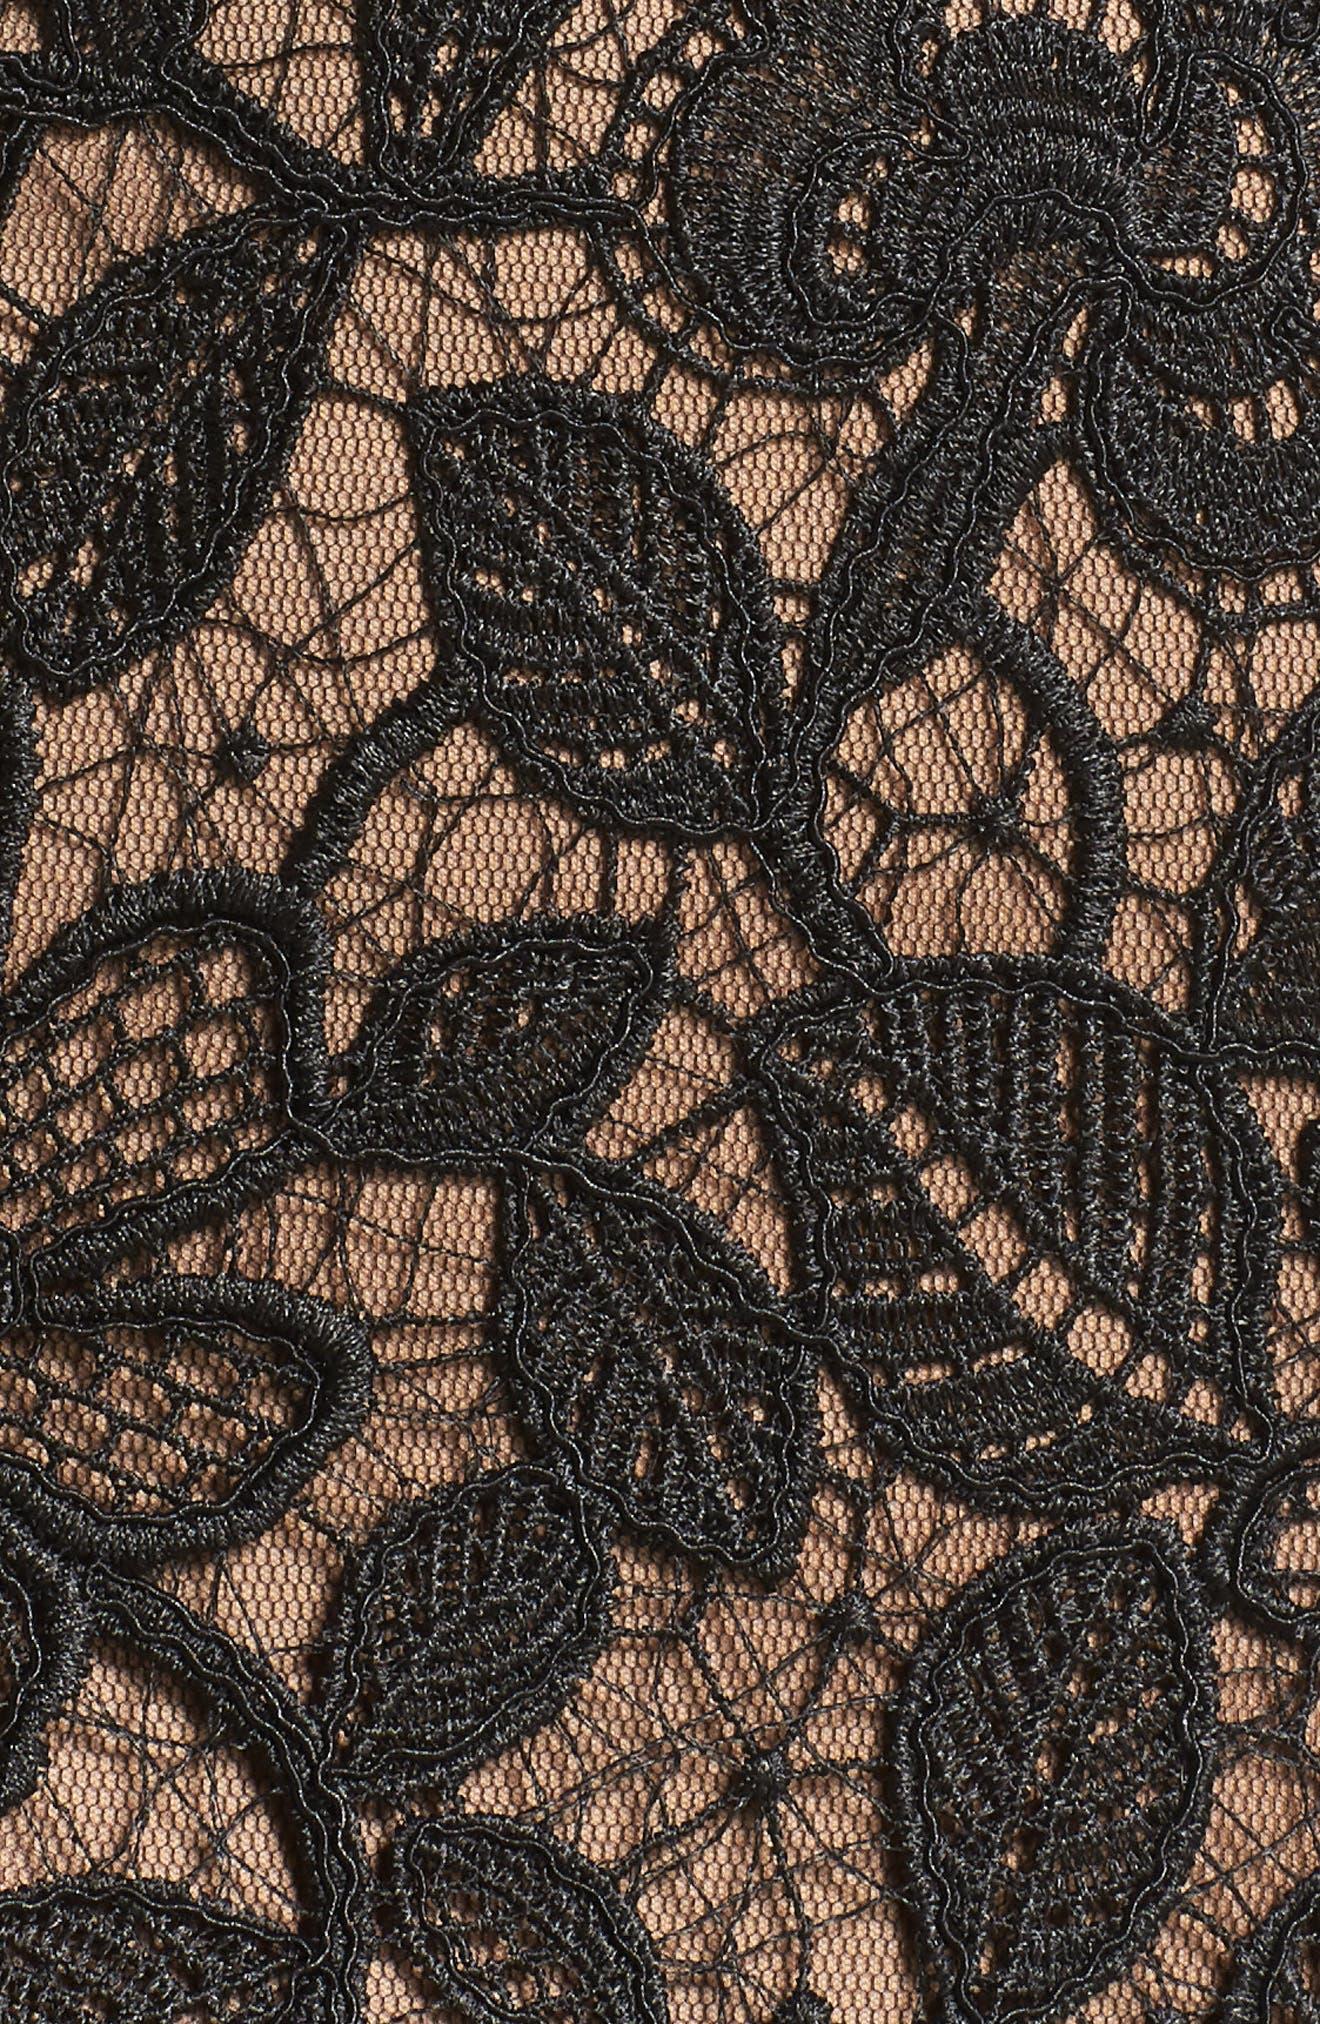 Lace Trumpet Gown,                             Alternate thumbnail 6, color,                             Black/ Nude